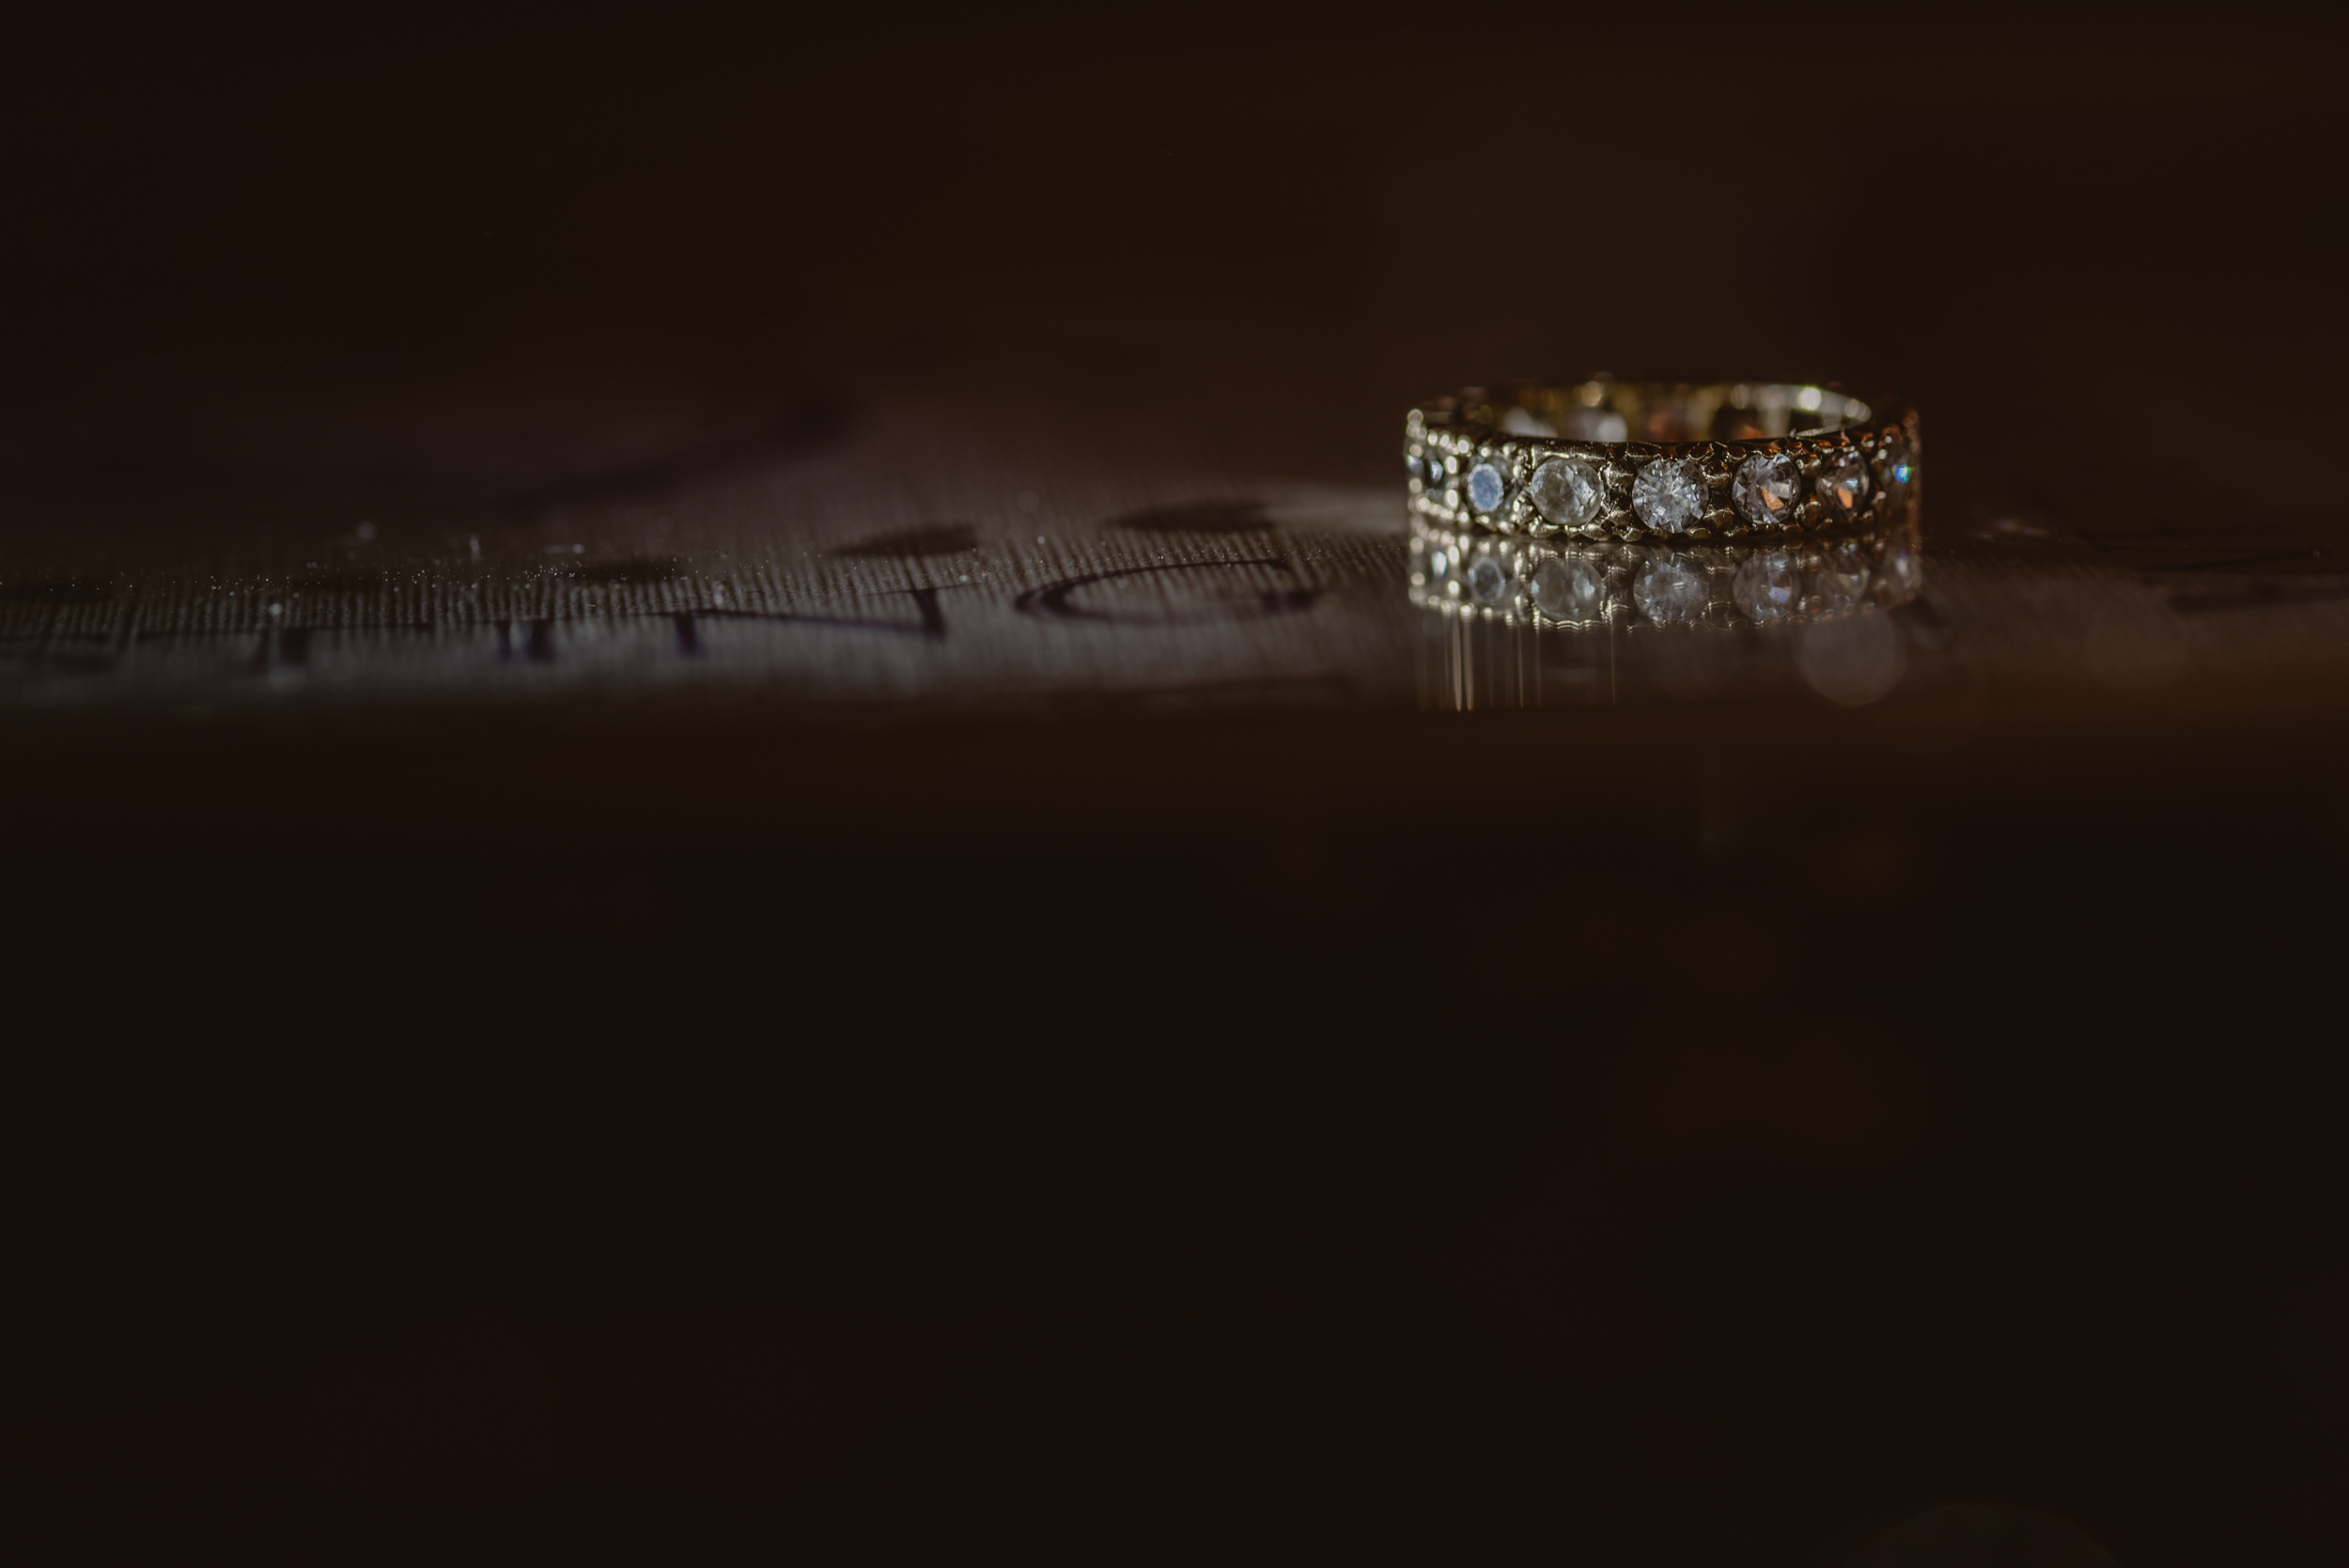 Chantelle-and-Stephen-Old-Thorns-Hotel-Wedding-Liphook-Manu-Mendoza-Wedding-Photography-058.jpg